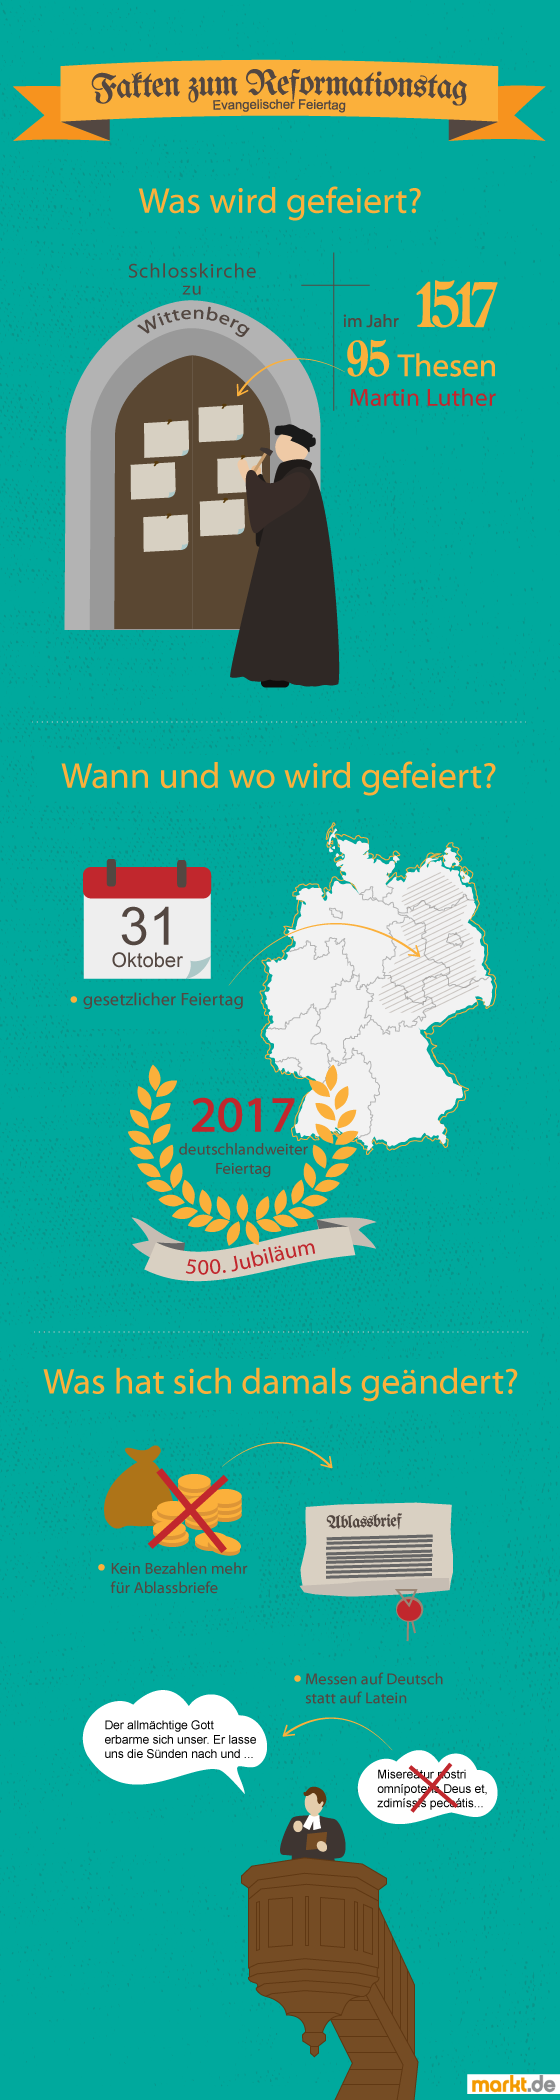 Reformationstag Feiertag?